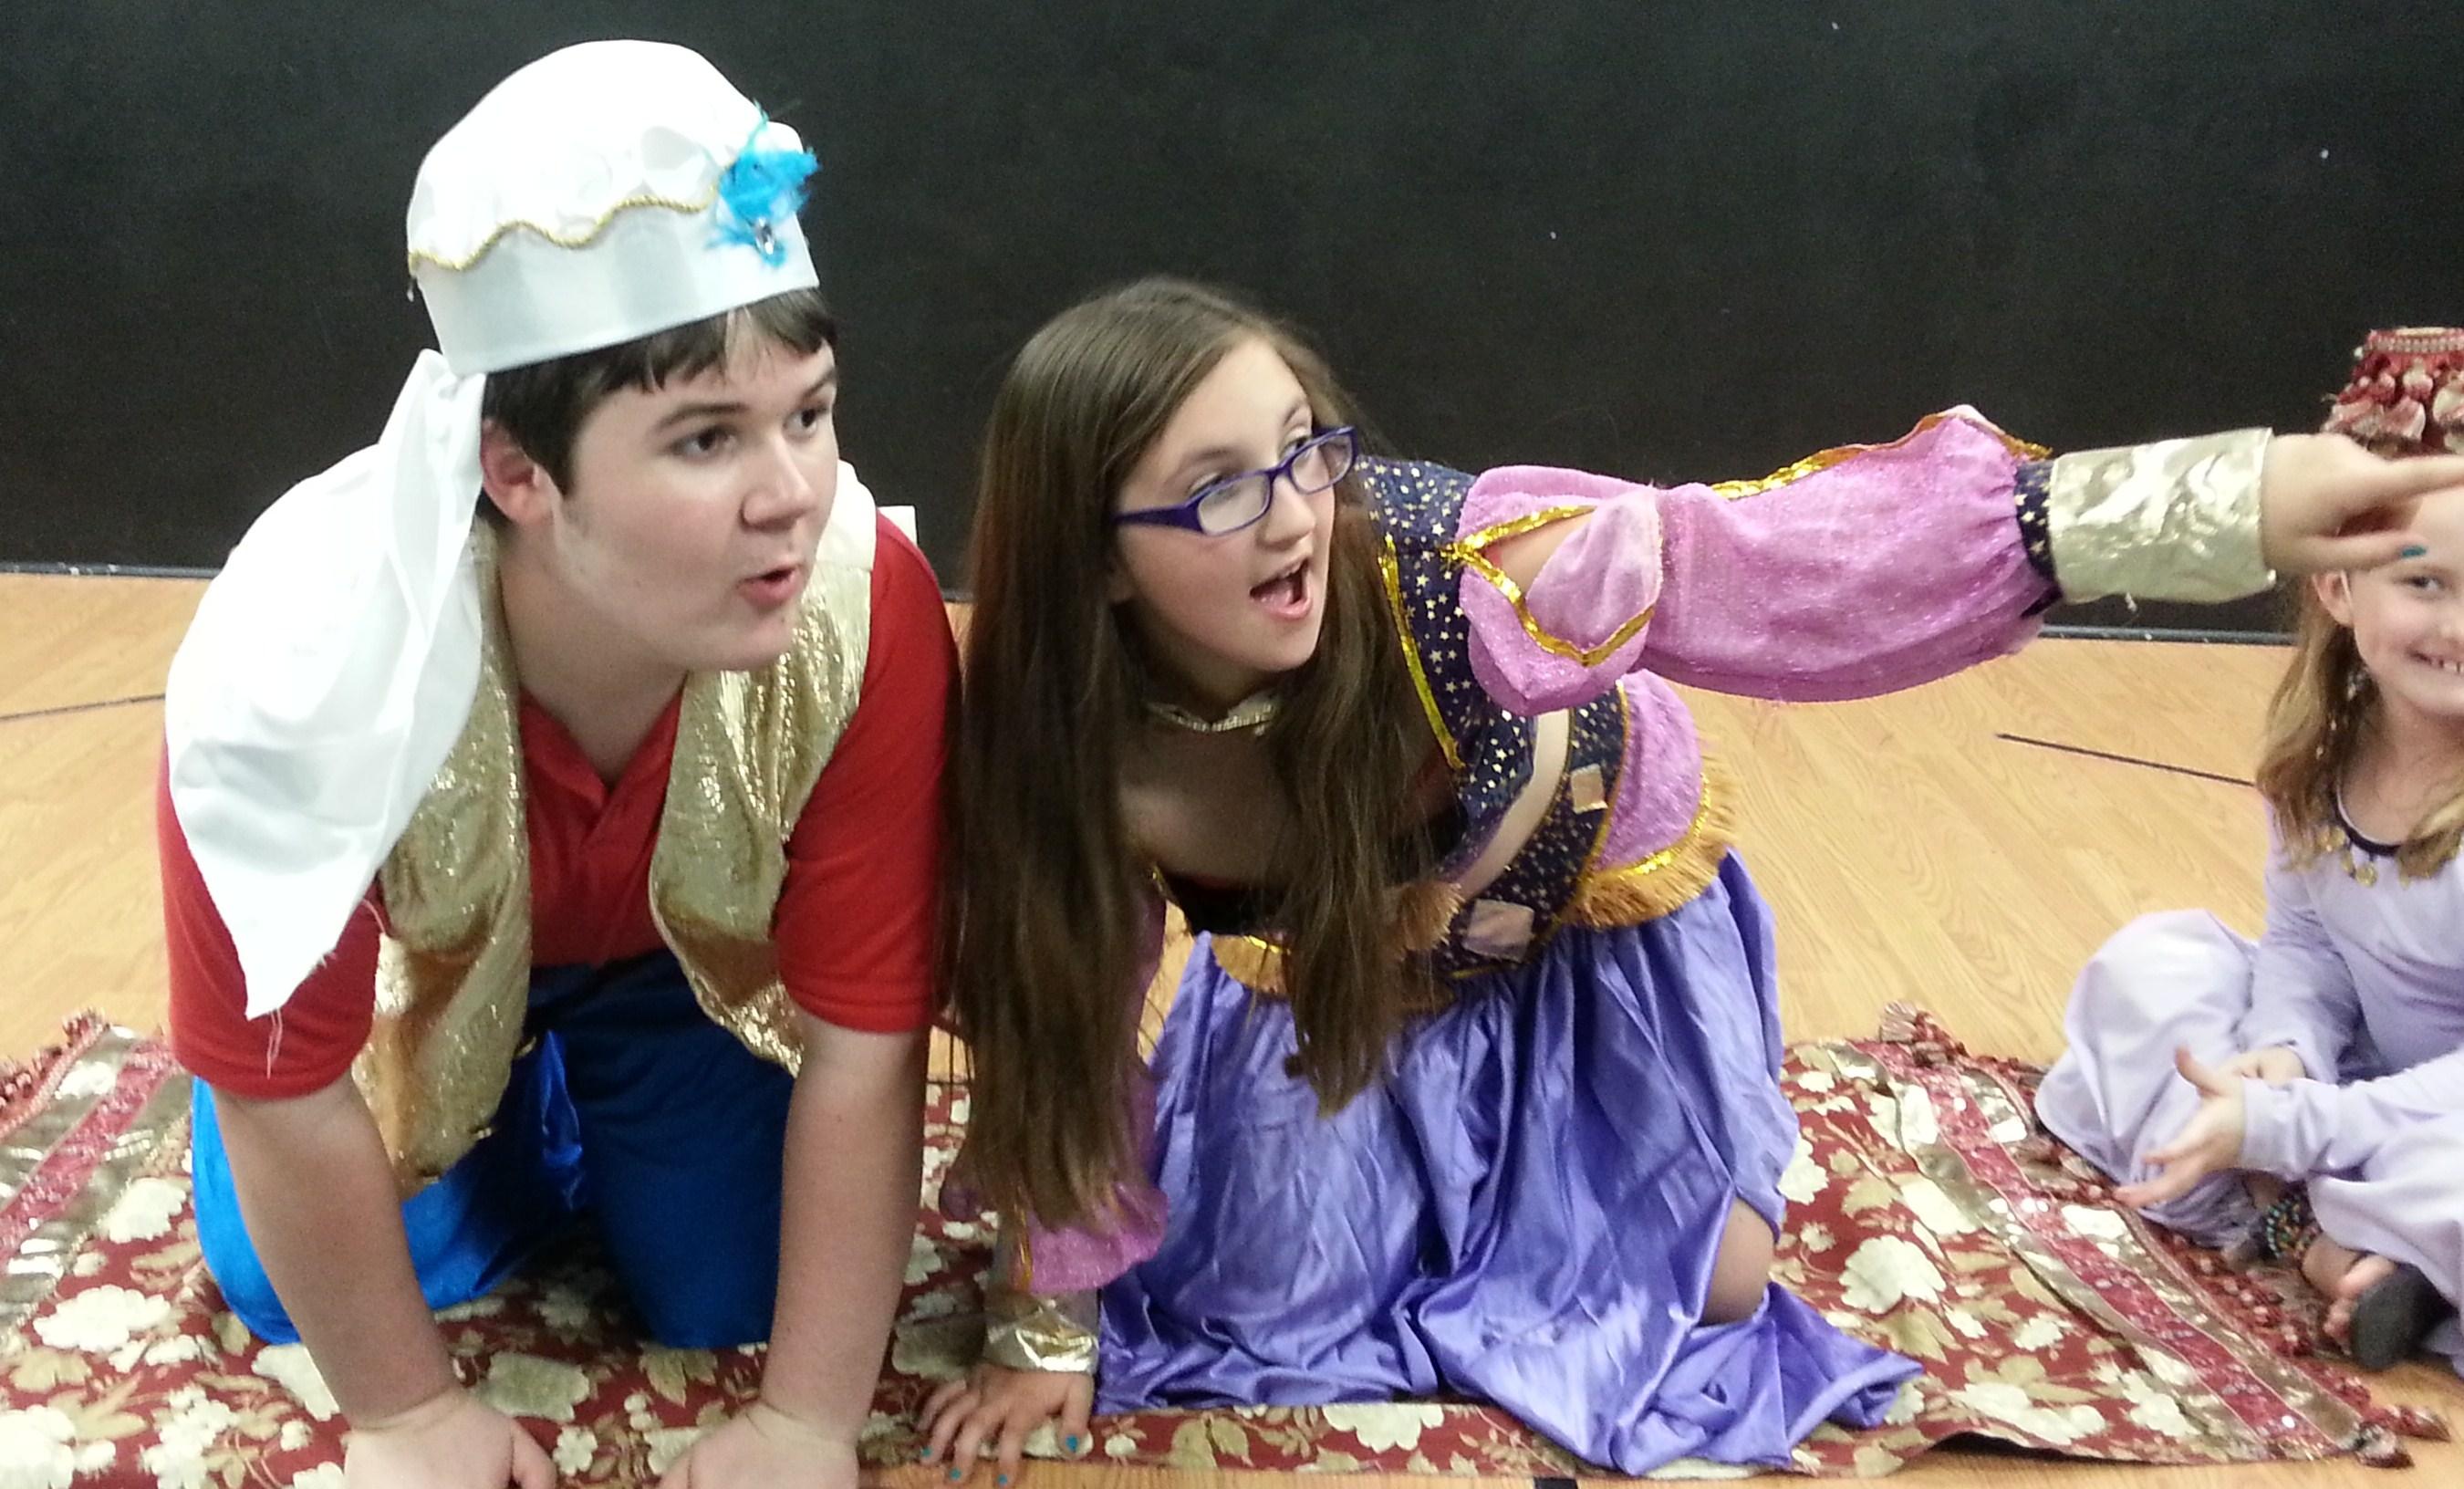 Aladdin and Genie on Carpet